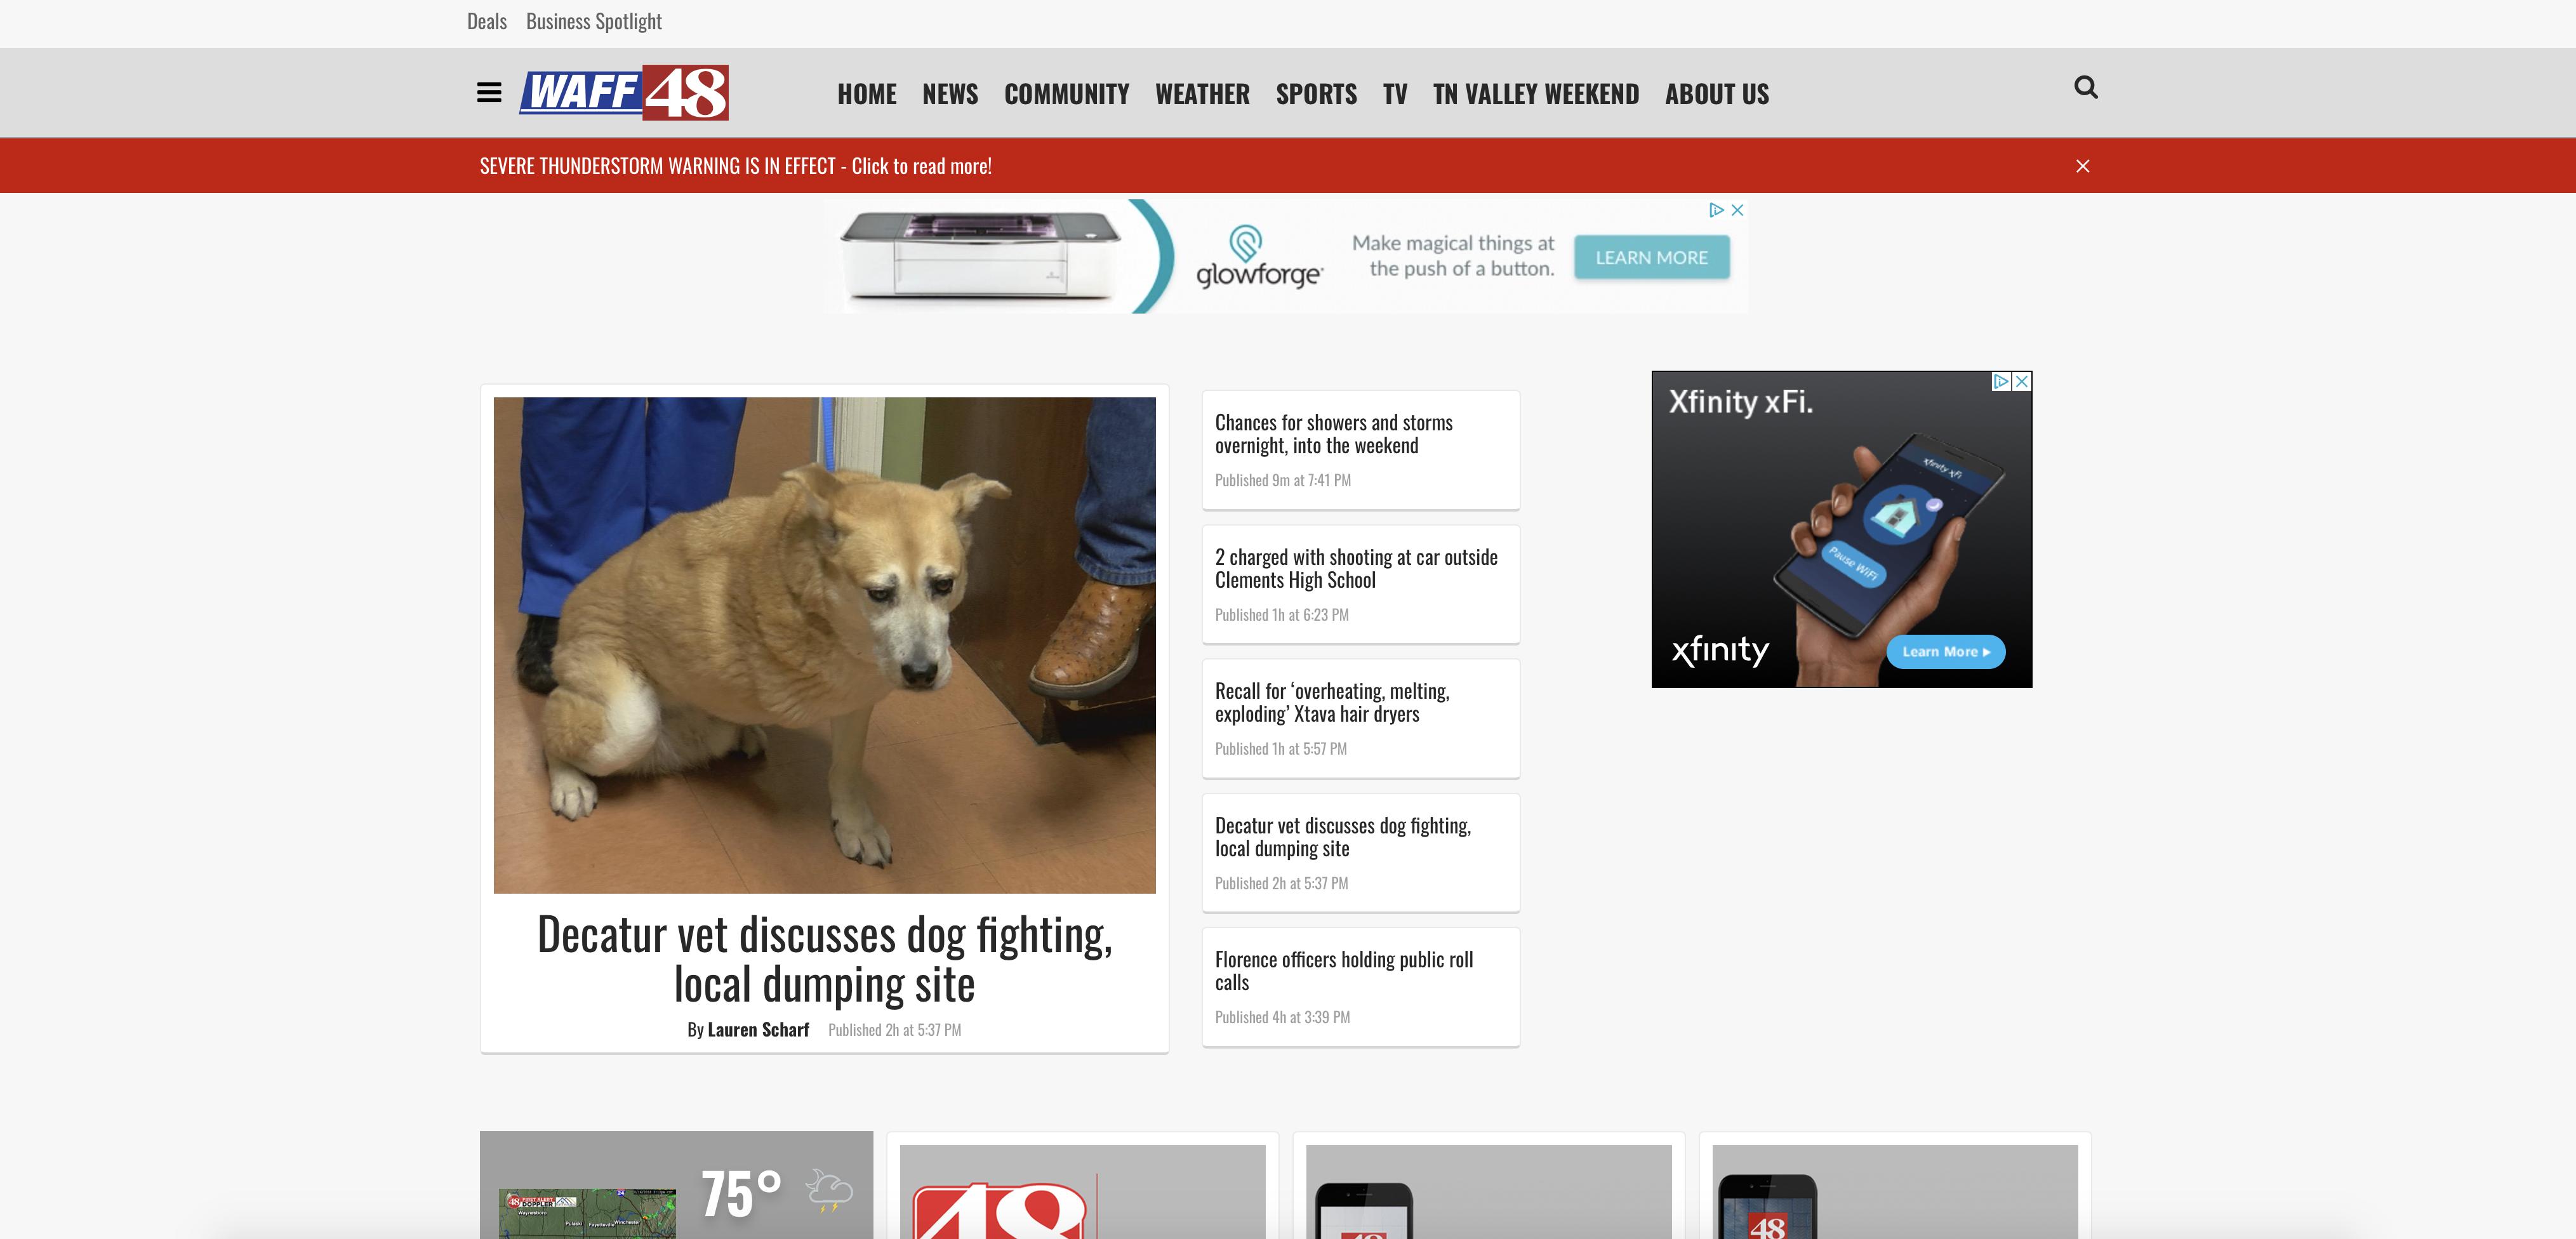 Gray/Raycom Merger Thread - Page 9 - General TV - TVNewsTalk net